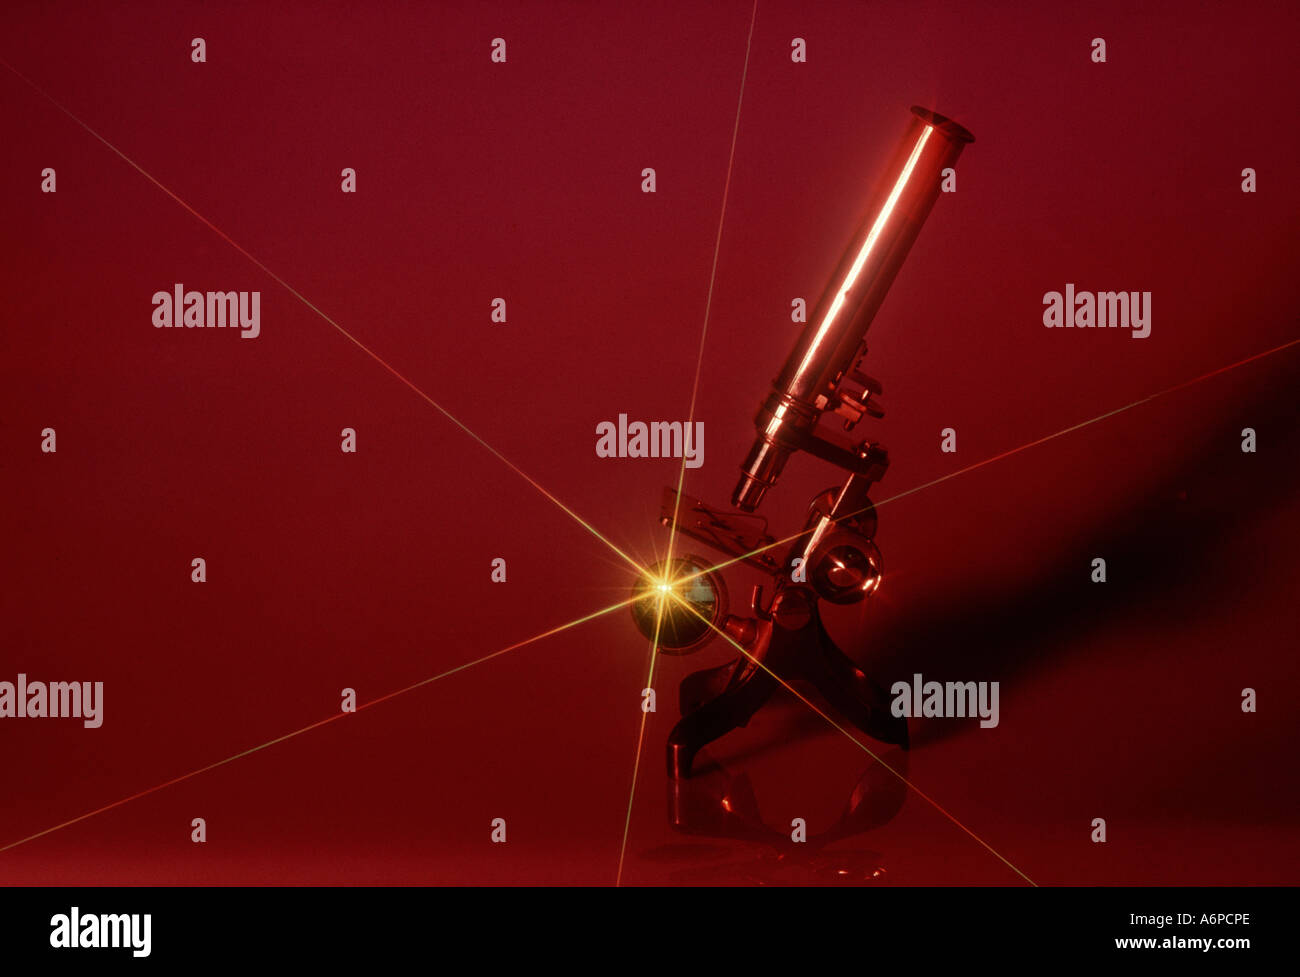 Brass Lighting Stockfotos & Brass Lighting Bilder - Alamy